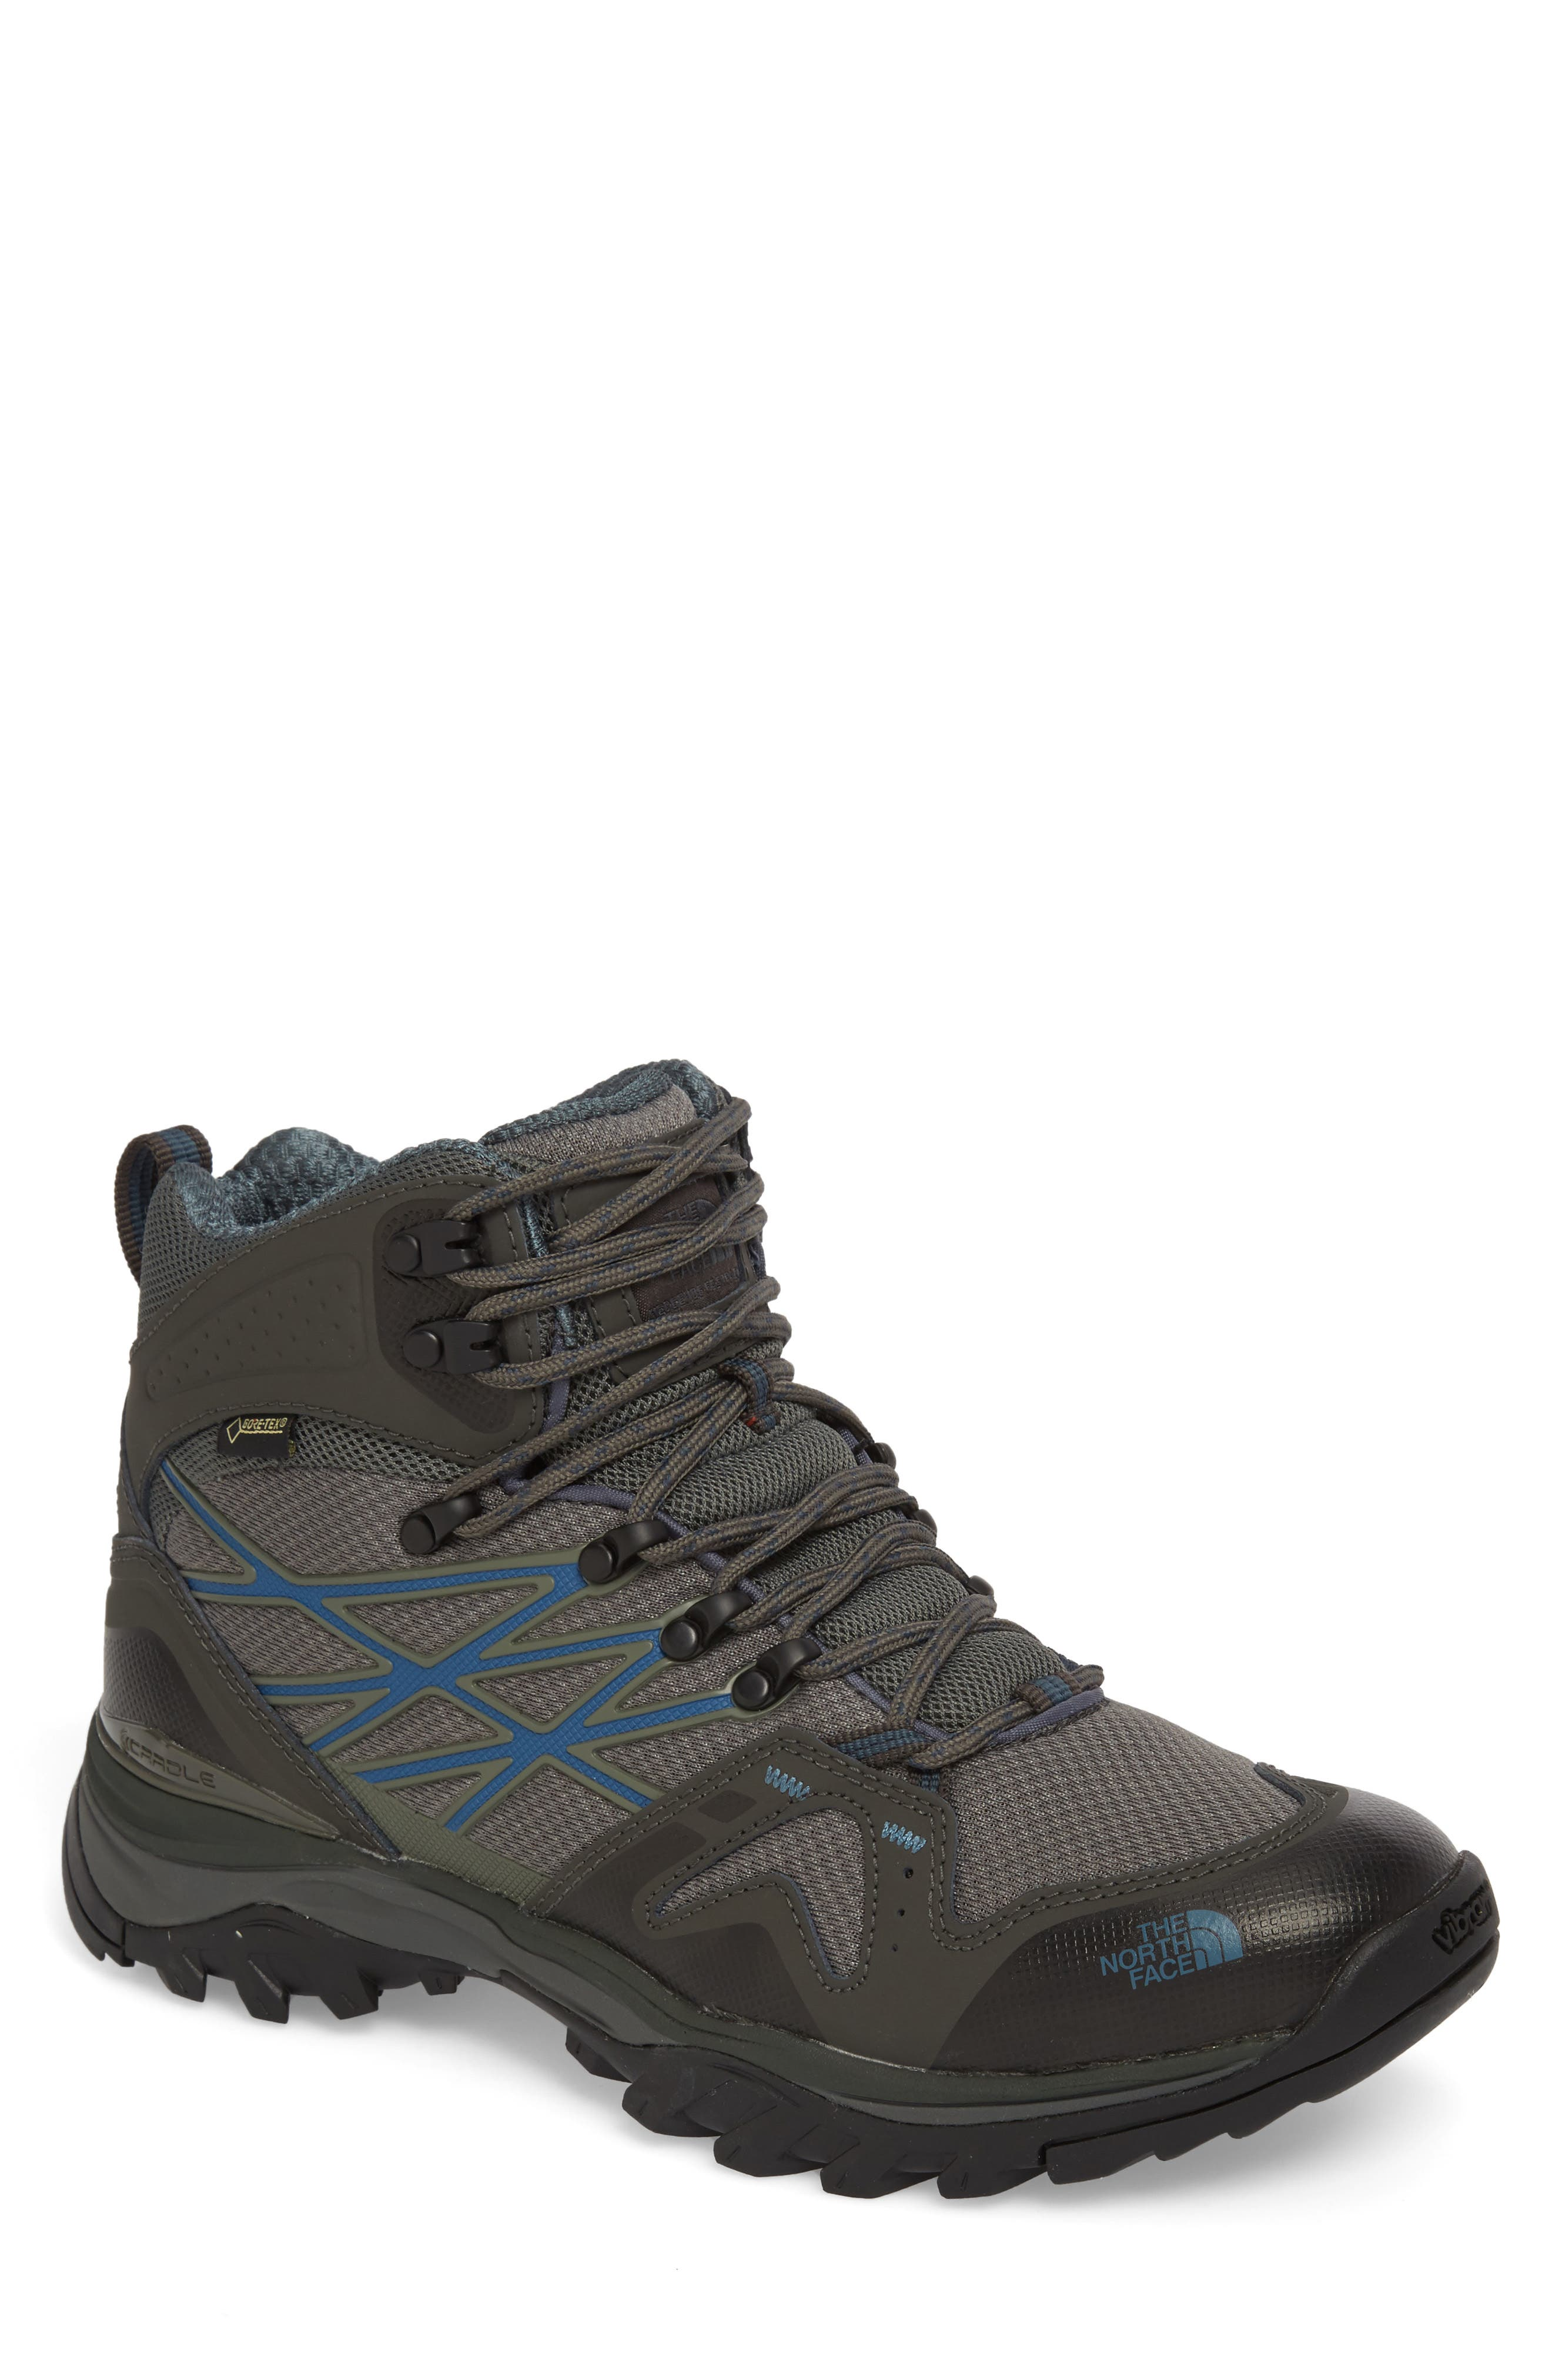 Hedgehog Fastpack Mid Gore-Tex<sup>®</sup> Waterproof Hiking Shoe,                             Main thumbnail 1, color,